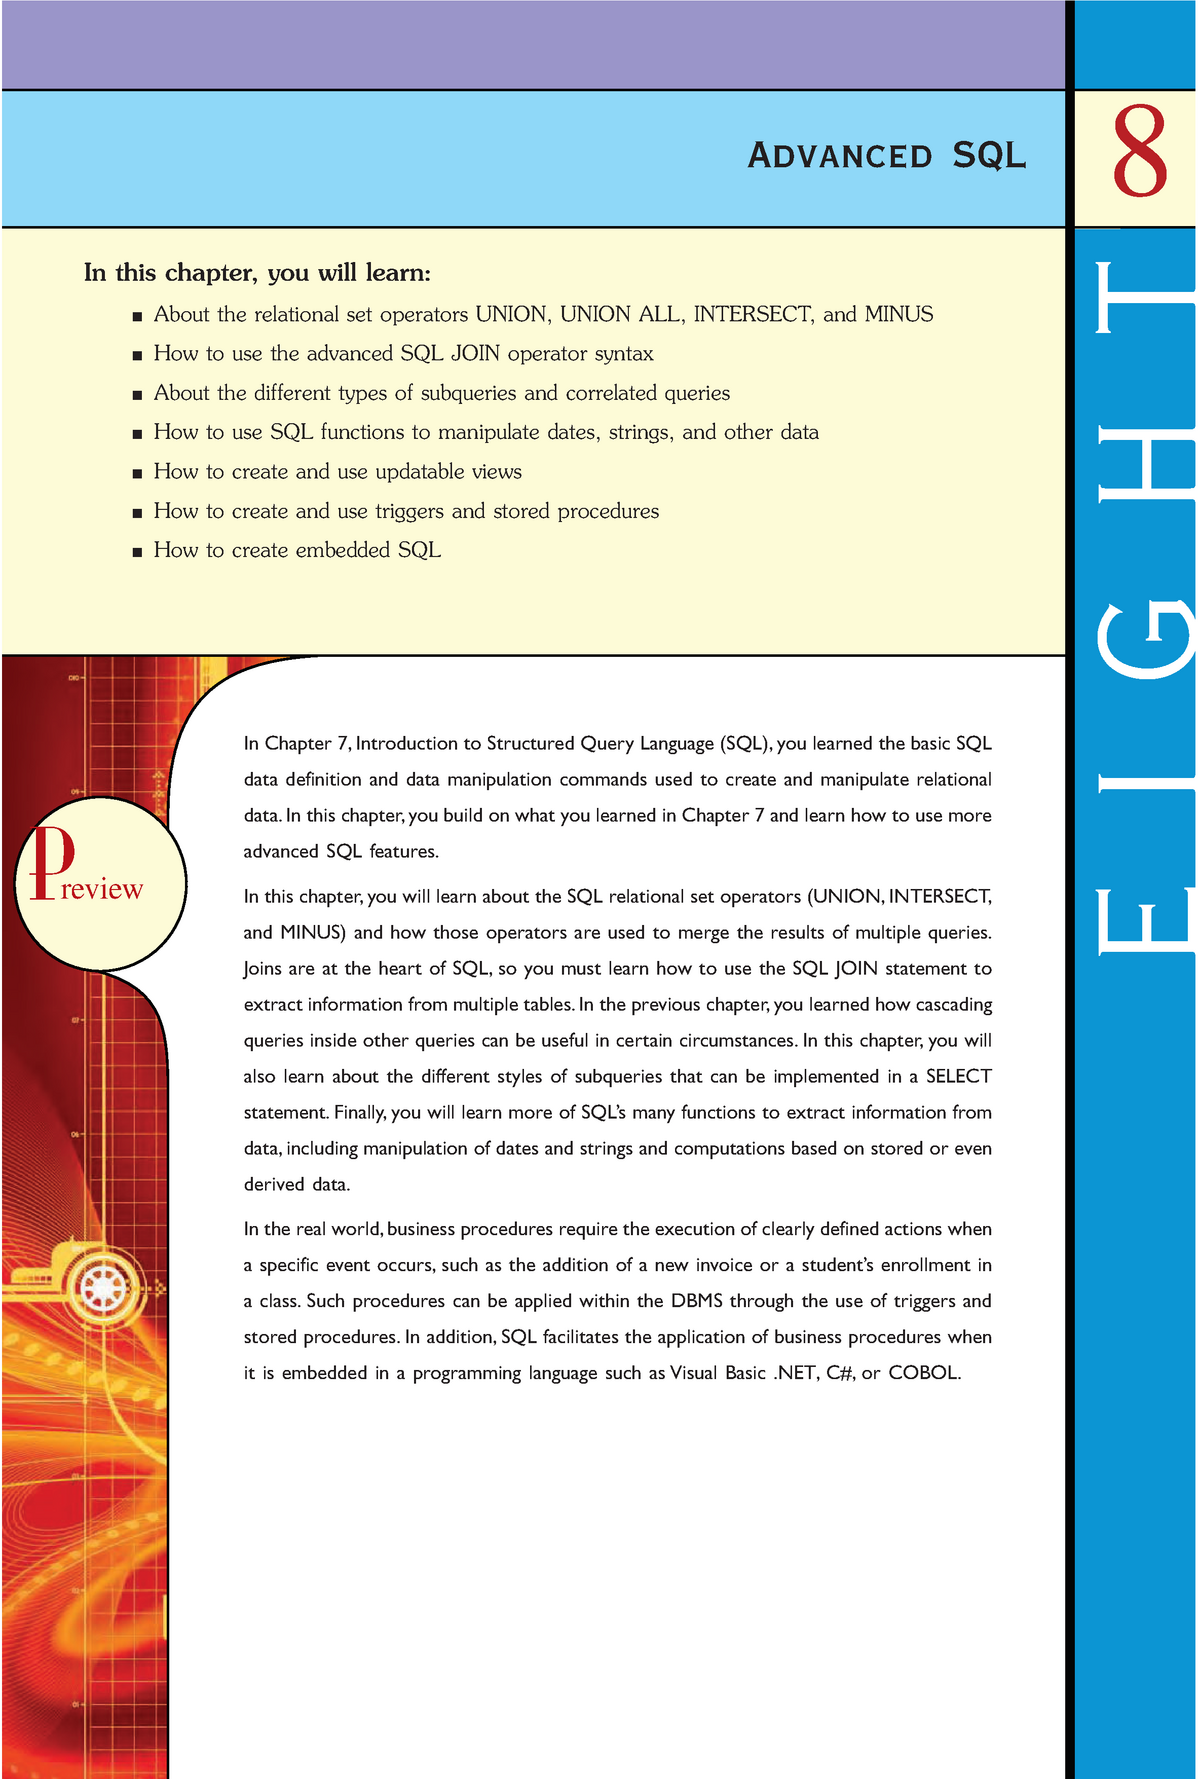 Chapter 08 Advanced SQL - INFS2608 - UNSW - StuDocu